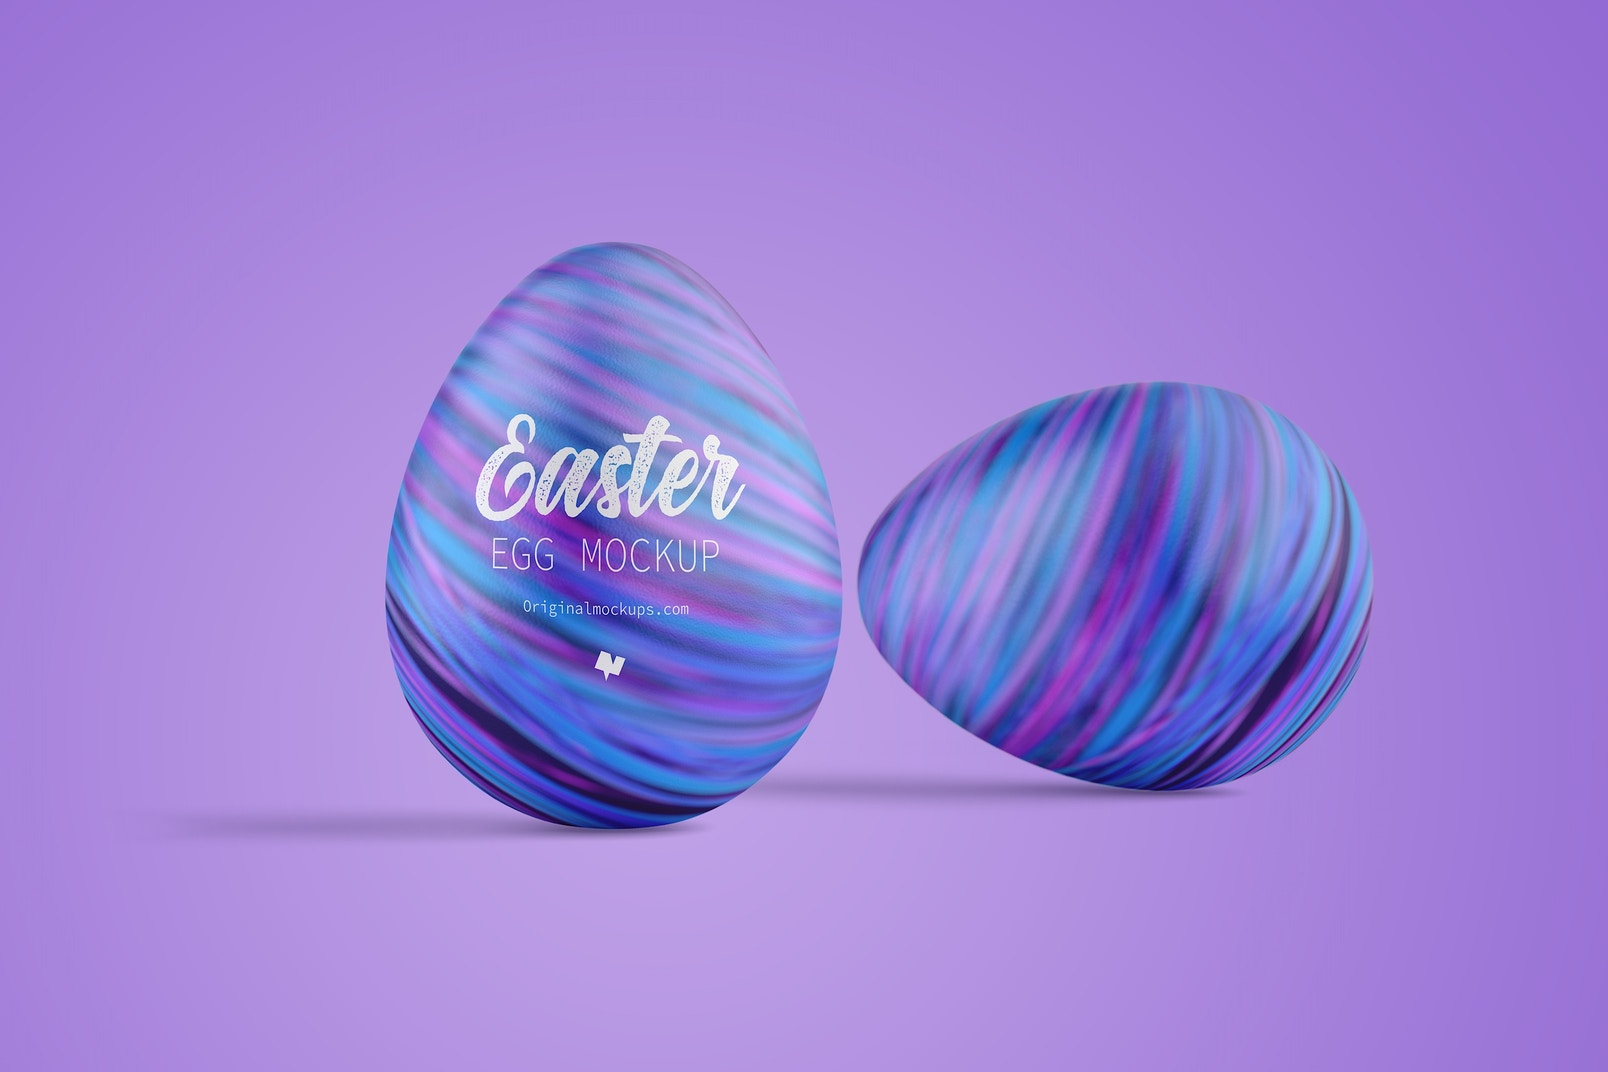 Easter Egg Mockup, Front View 02